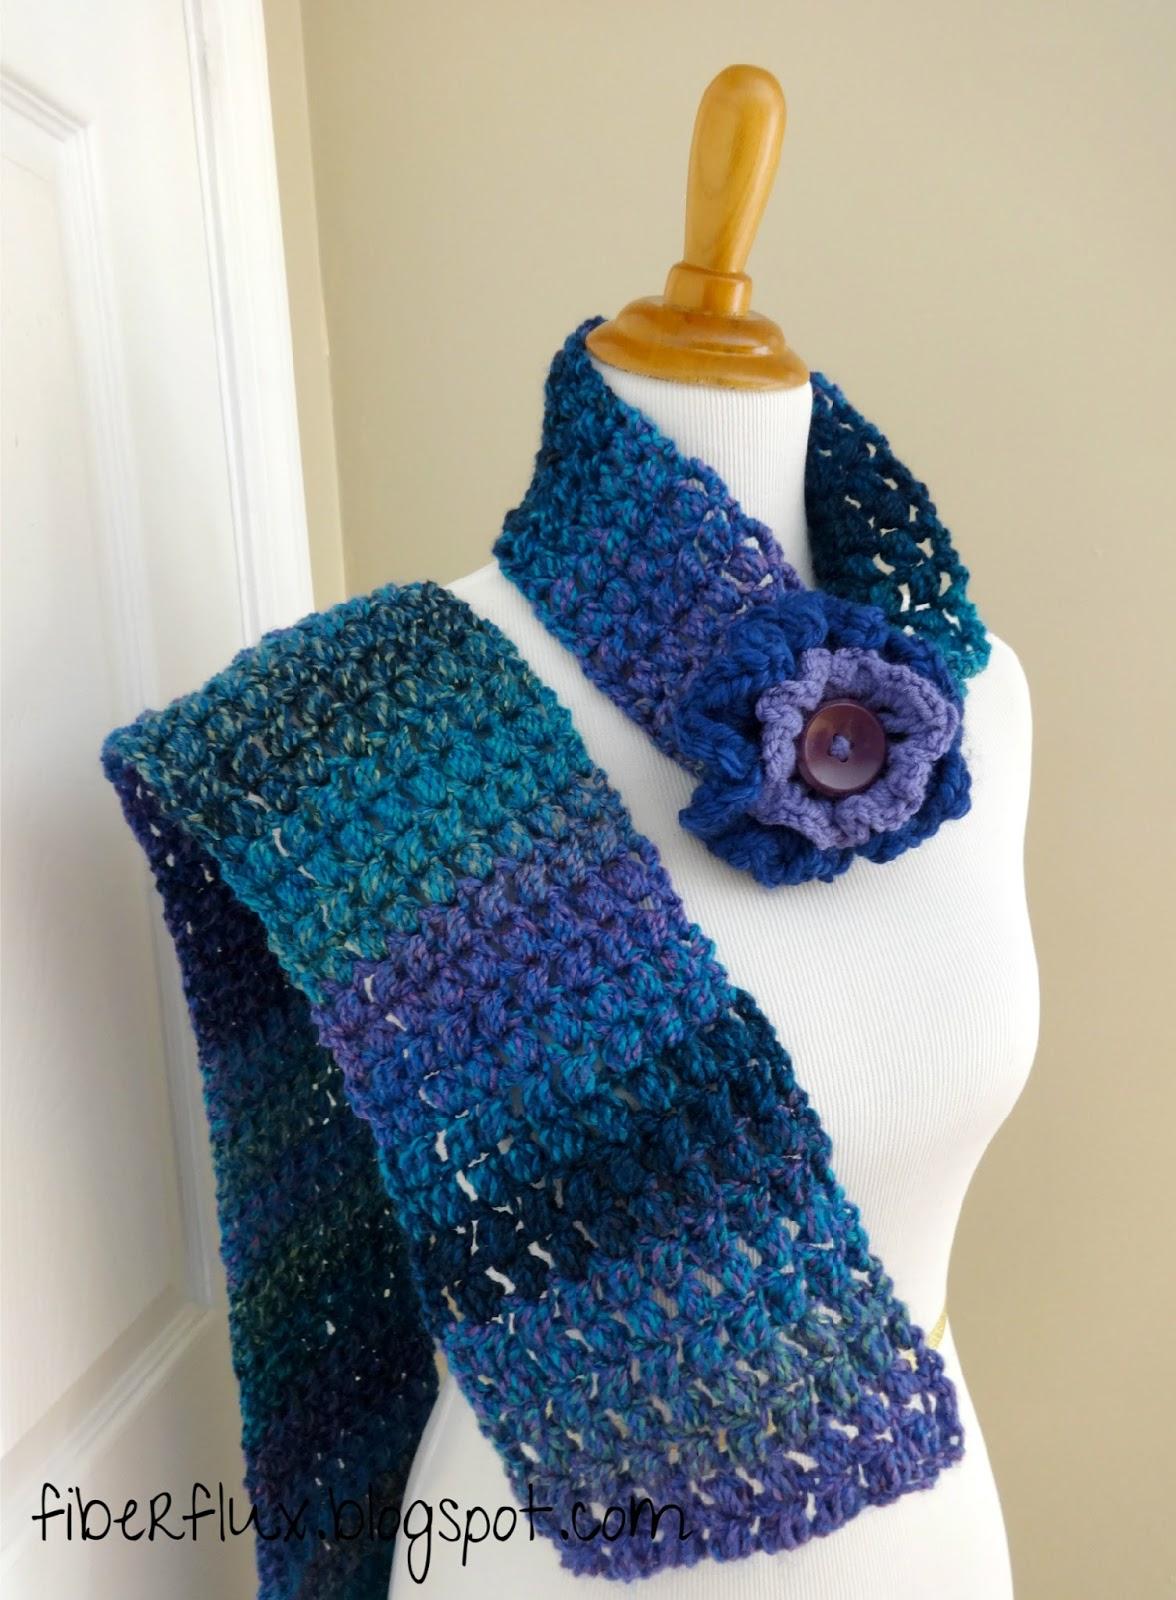 Fiber Flux Free Crochet Pattern Tweedy Puff Stitch Scarf